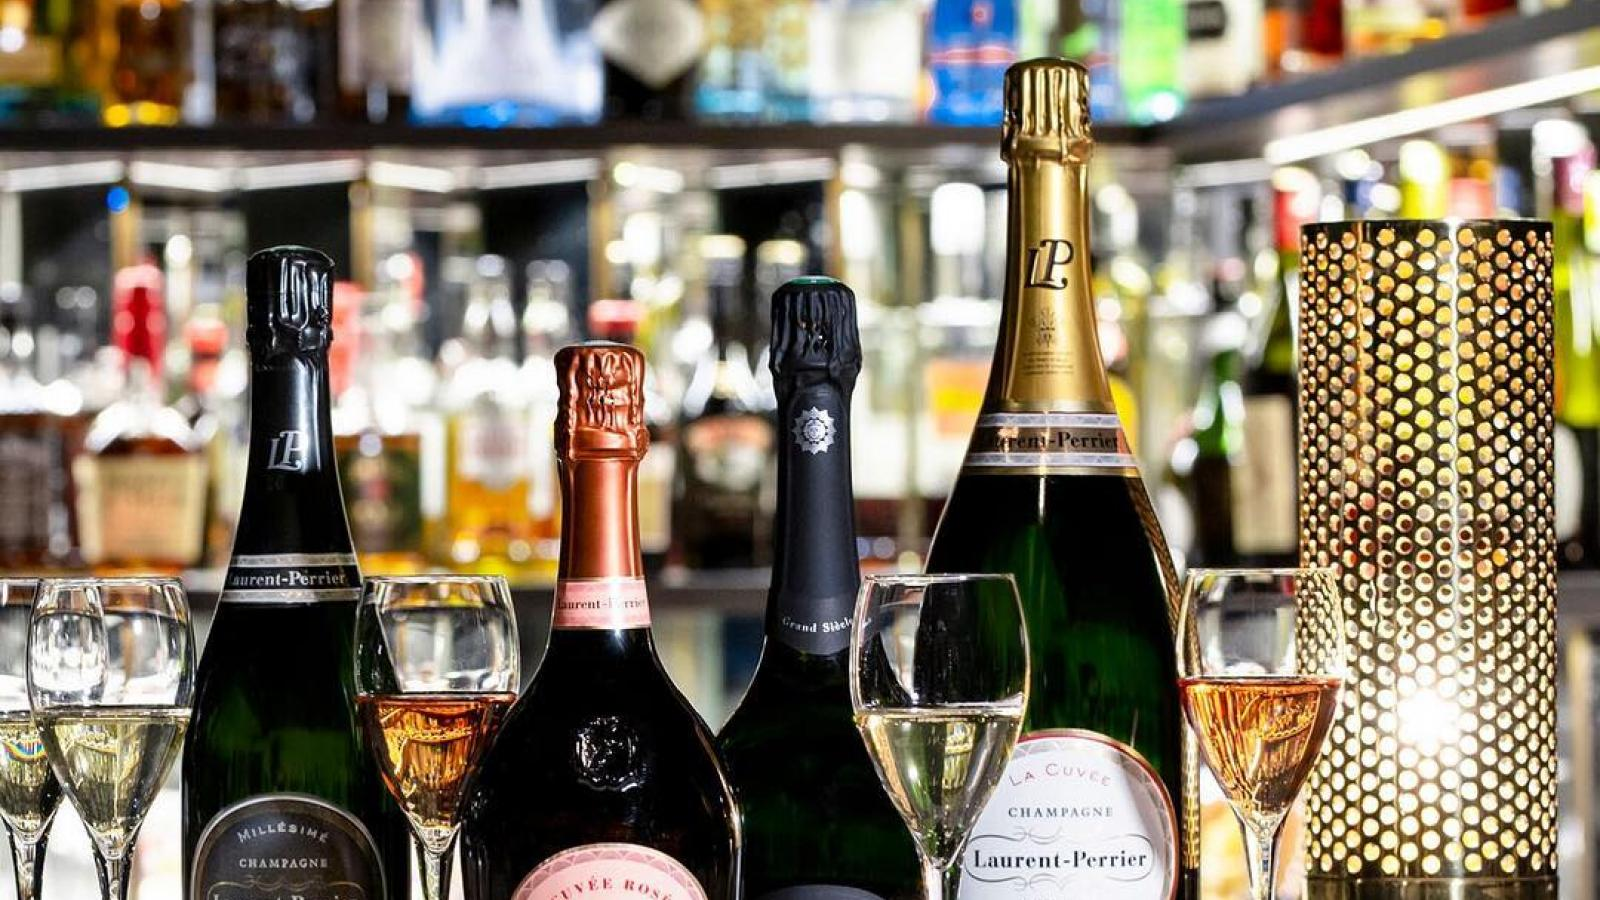 Enjoy tastings at the Roch Hotel & Spa